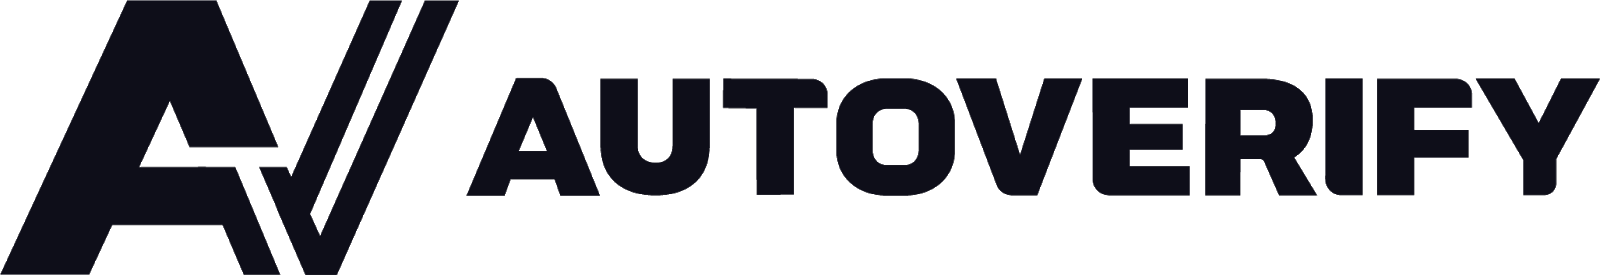 AutoVerify Logo